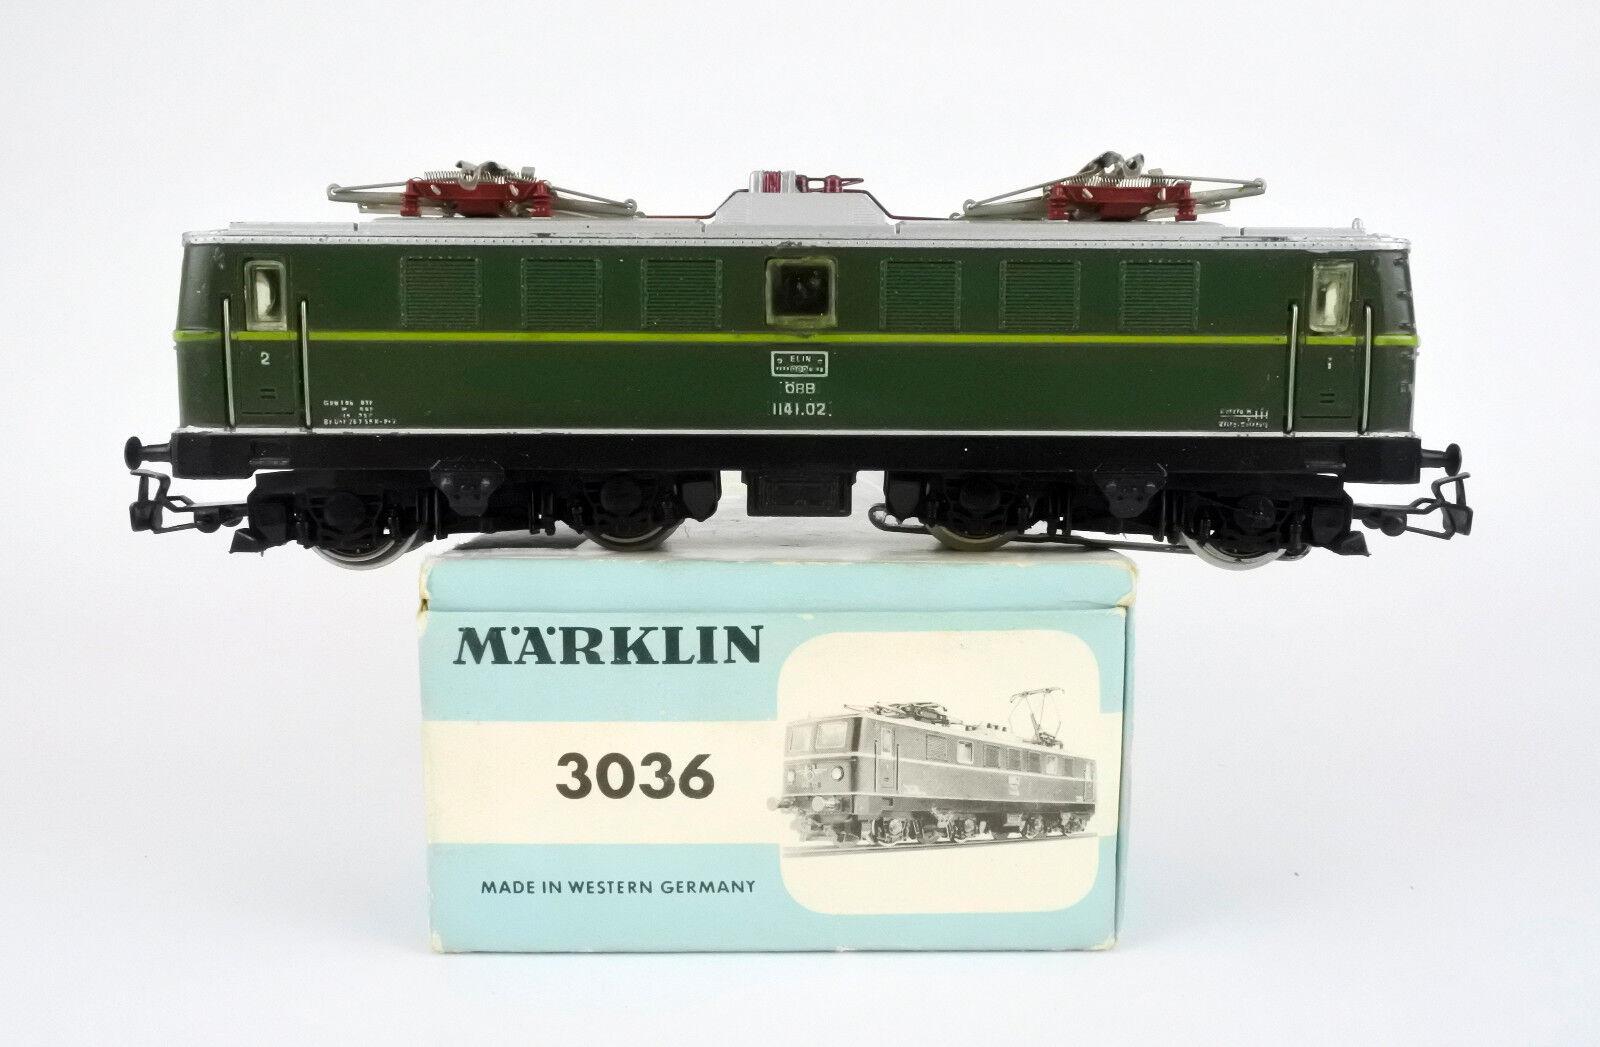 MARKLIN HO SCALE 3036 DIECAST OBB Grün ELECTRIC ENGINE  1141.02